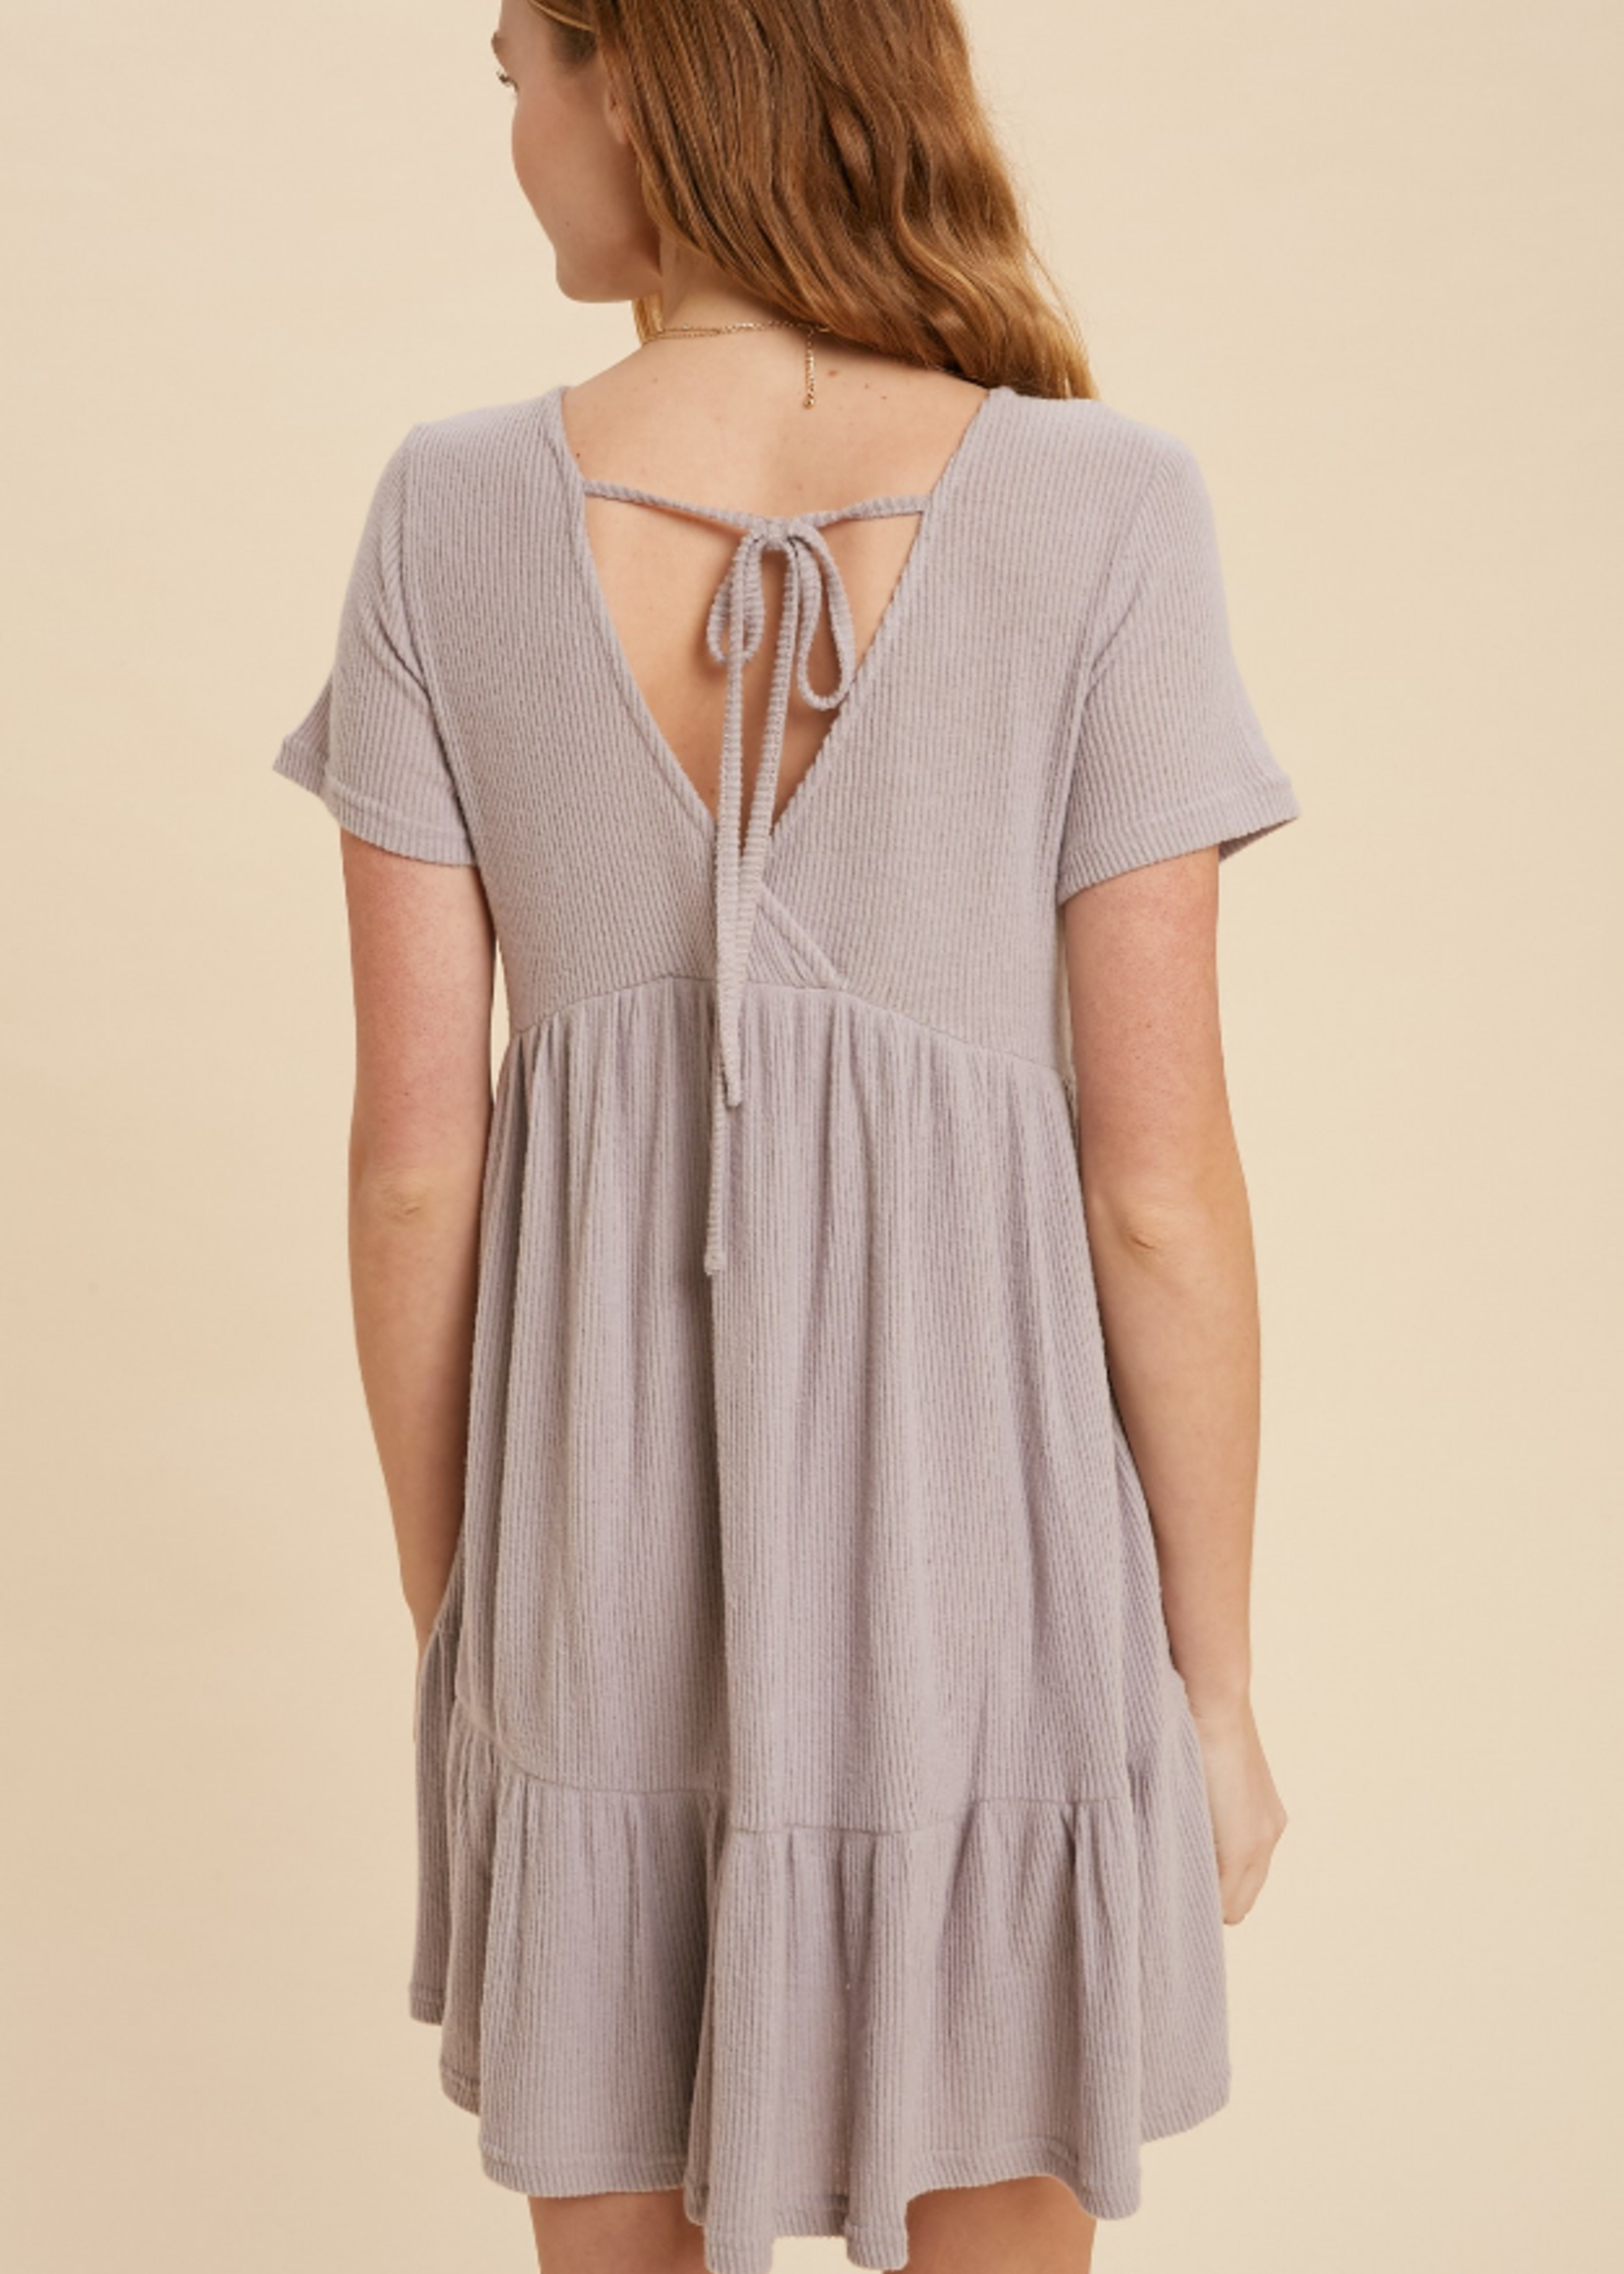 Ribbed Hacci Dress - Lilac